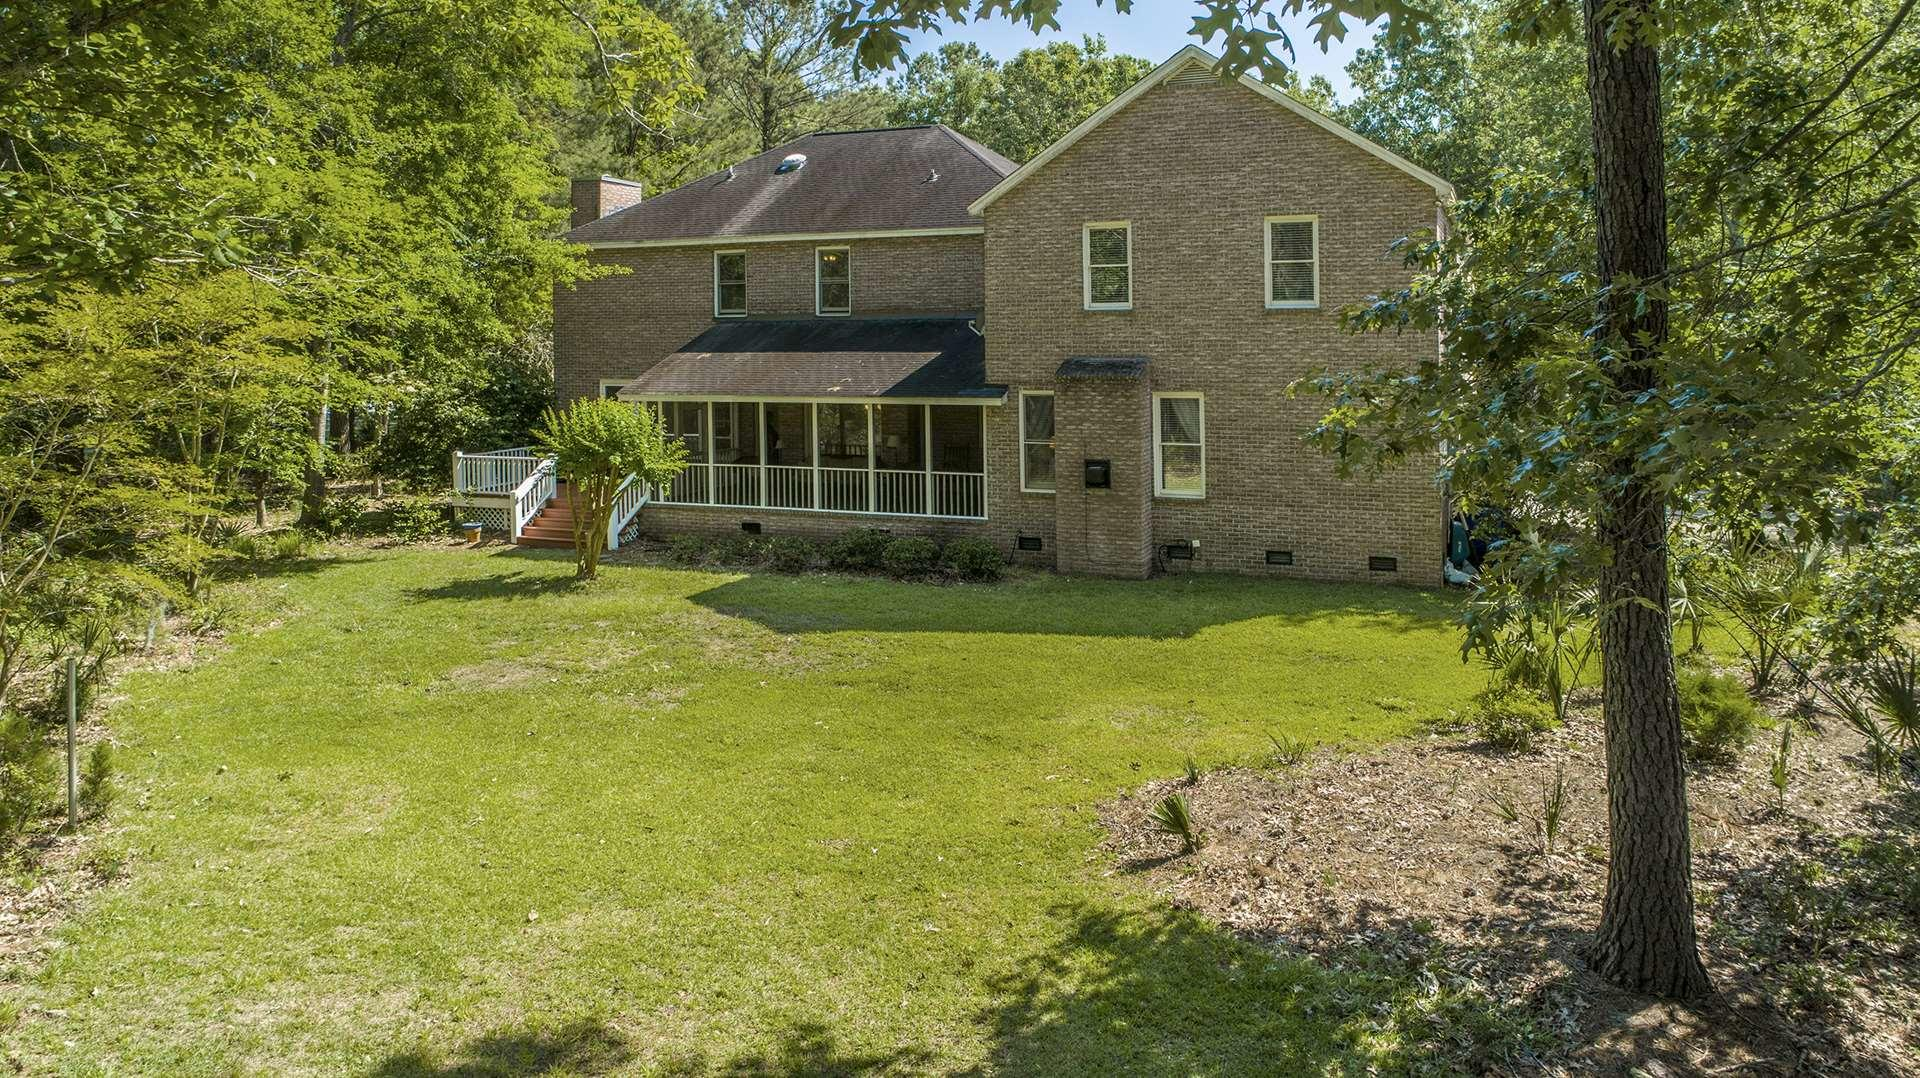 Dunes West Homes For Sale - 2961 Pignatelli, Mount Pleasant, SC - 57